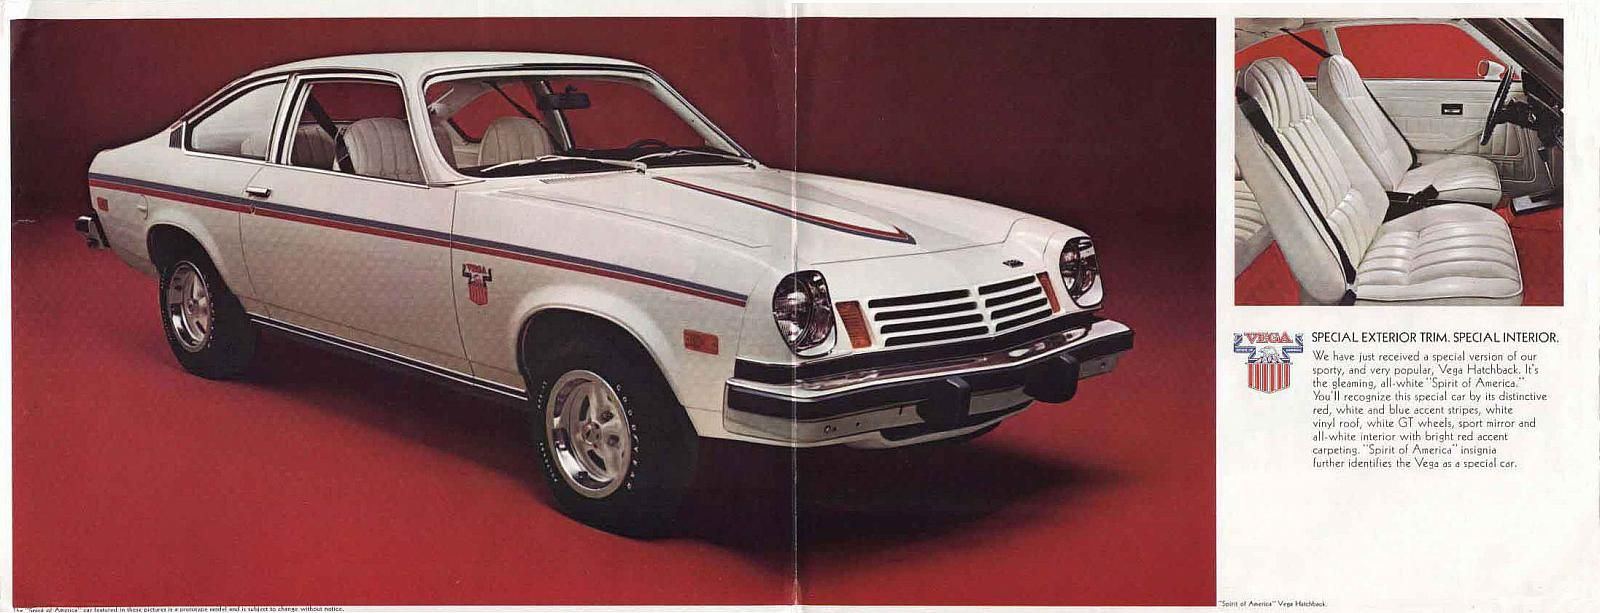 All Chevy 74 chevy vega gt : 1974